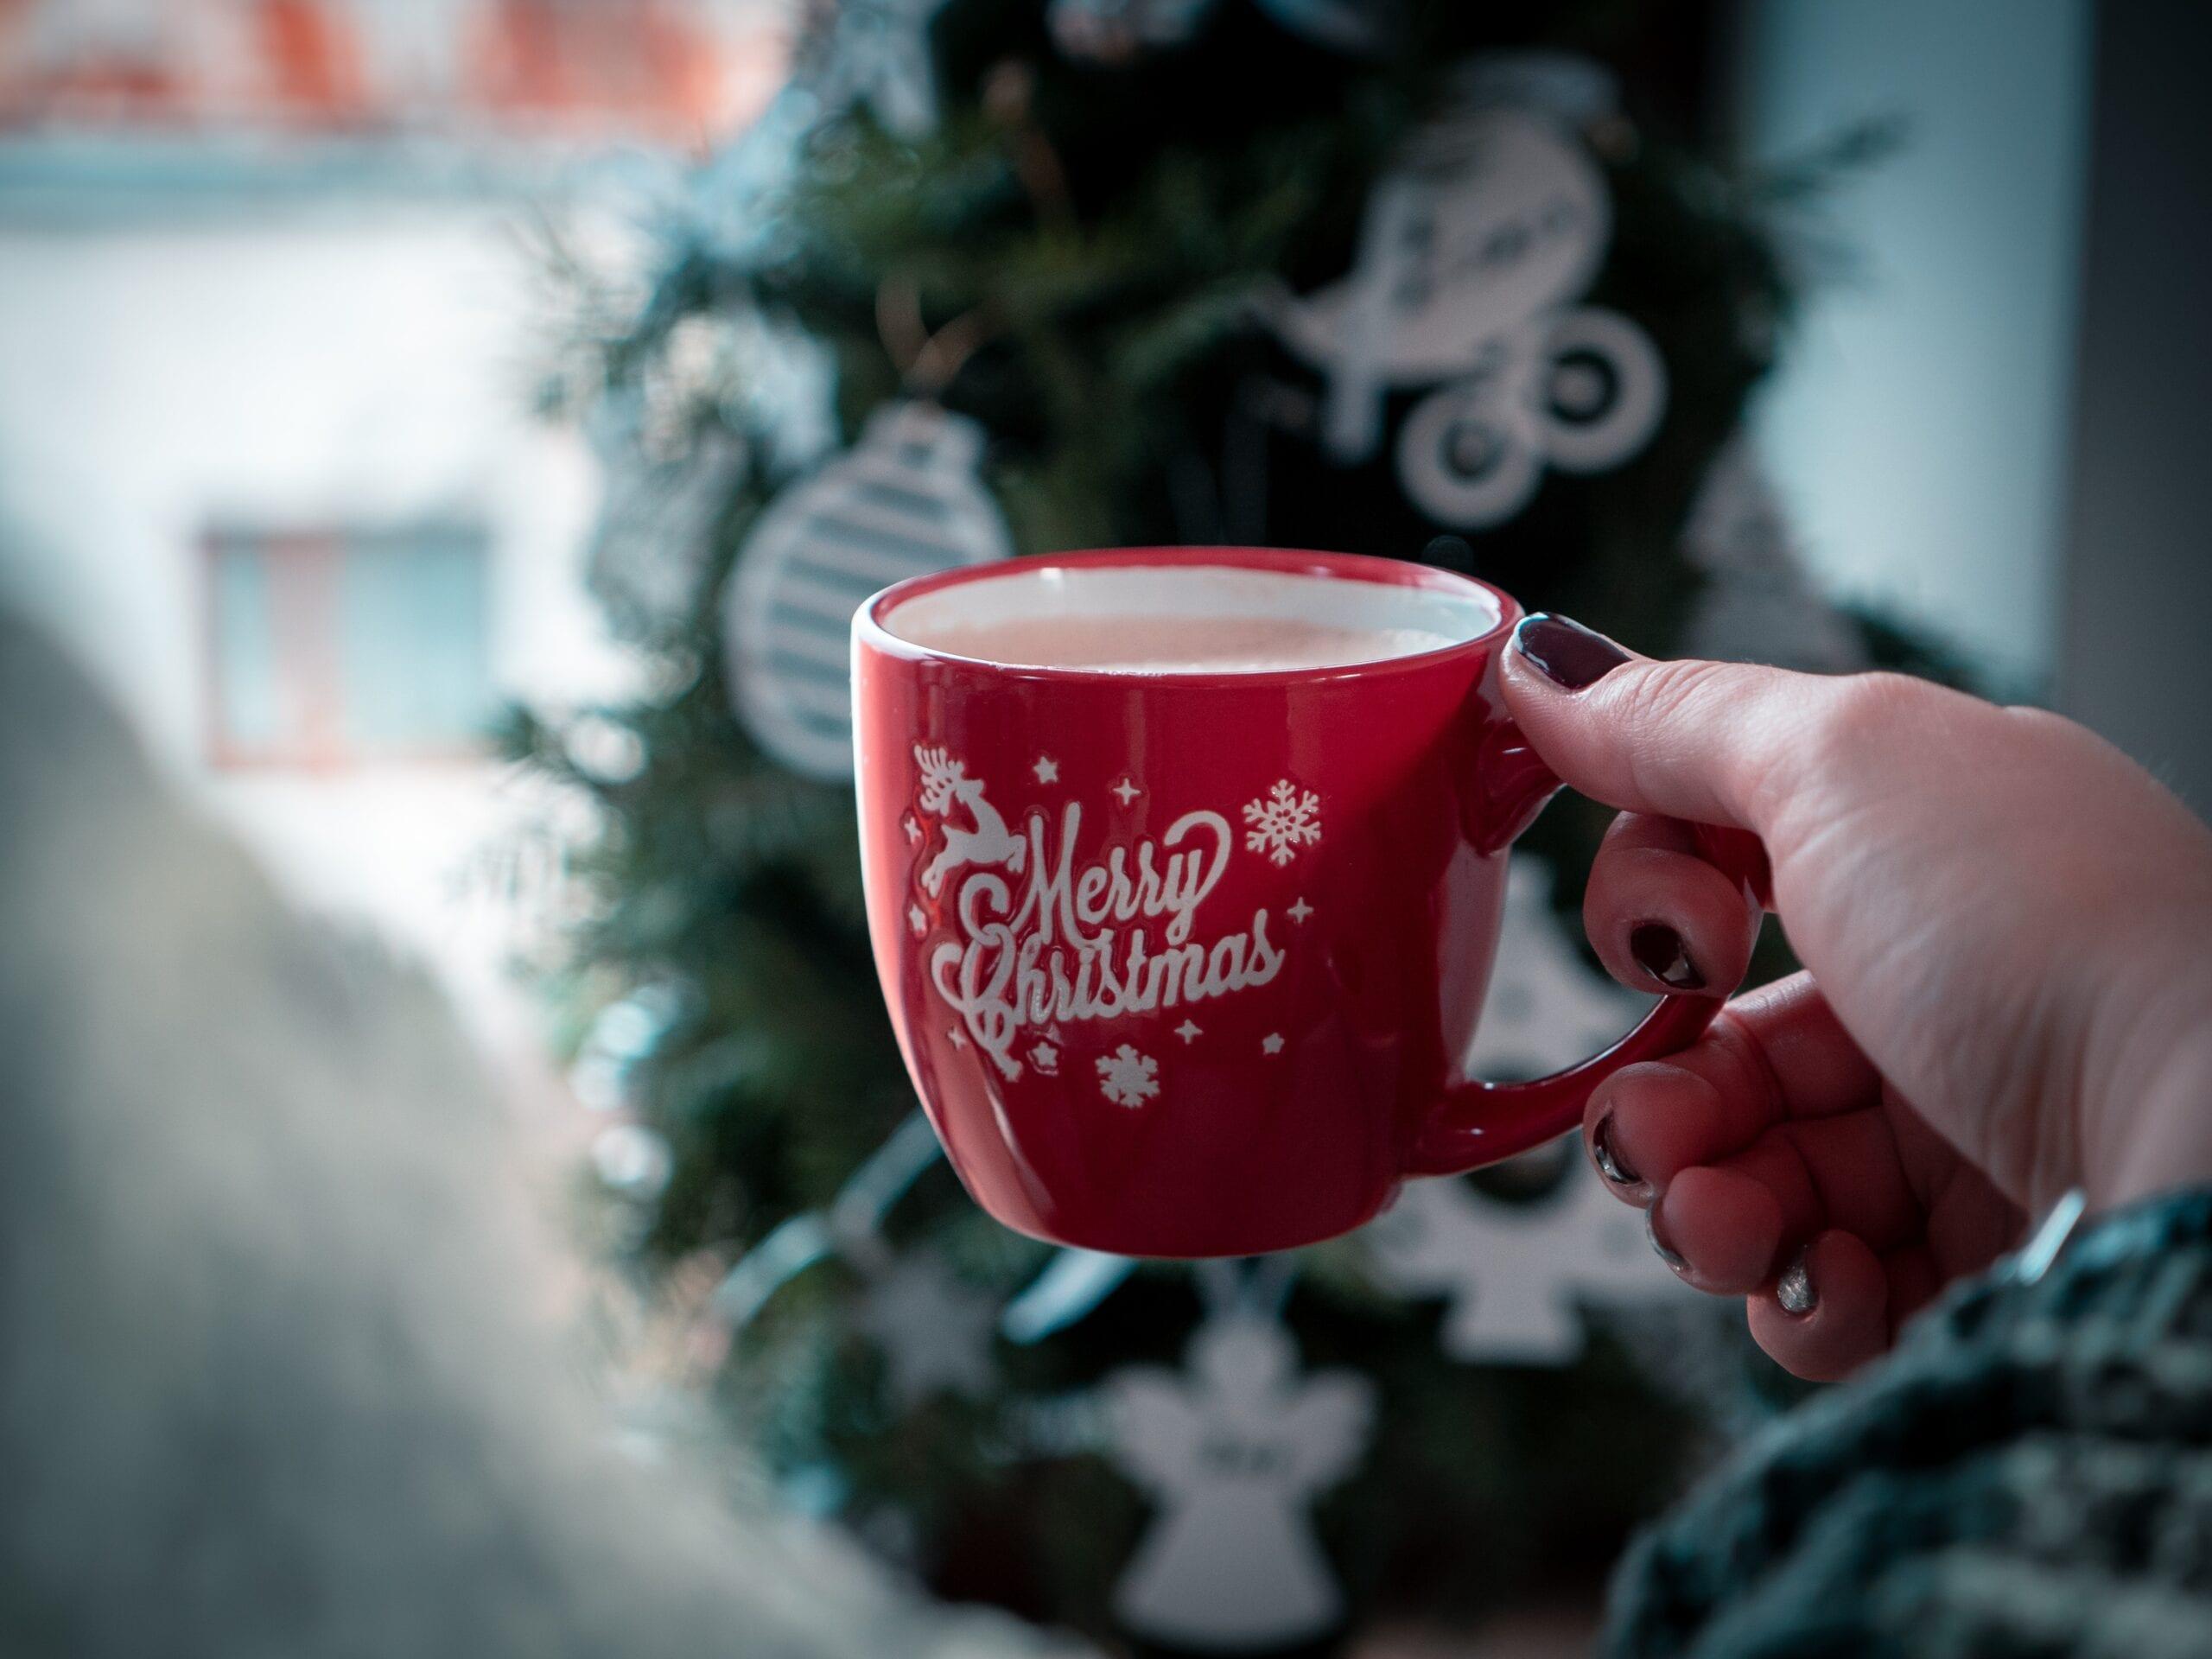 Woman drinking from Merry Christmas mug